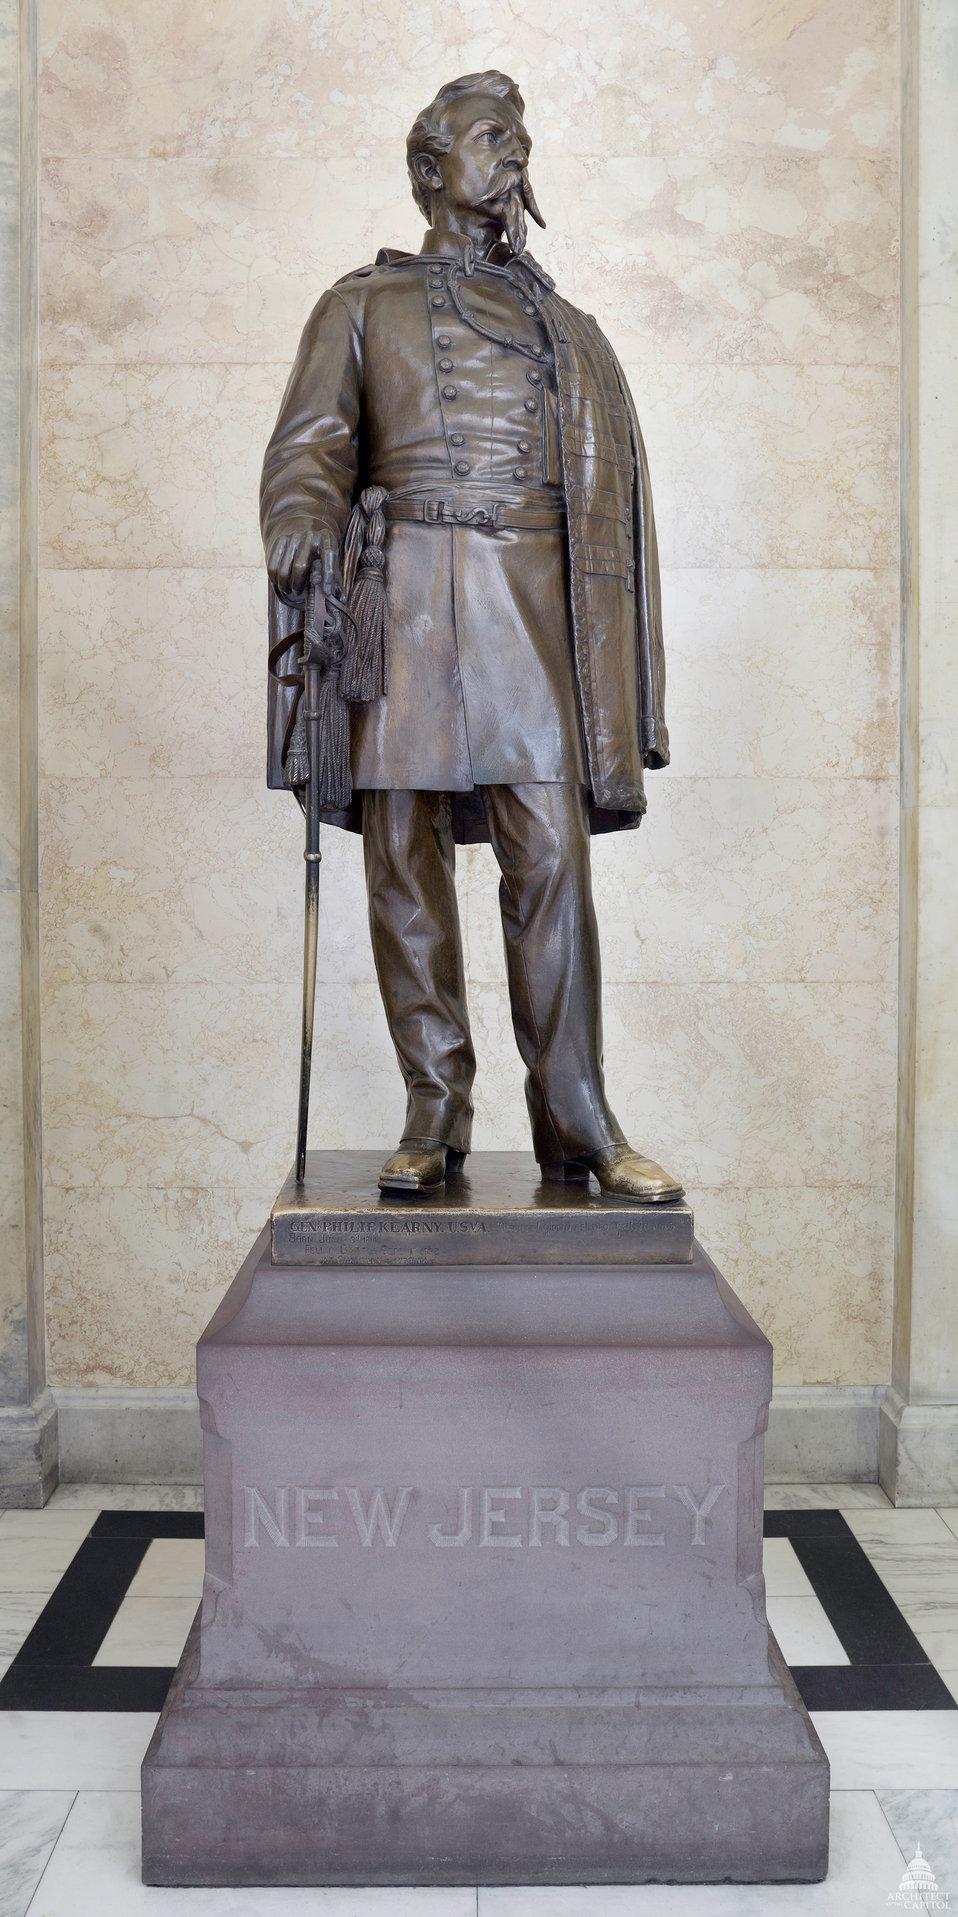 Philip Kearny Statue